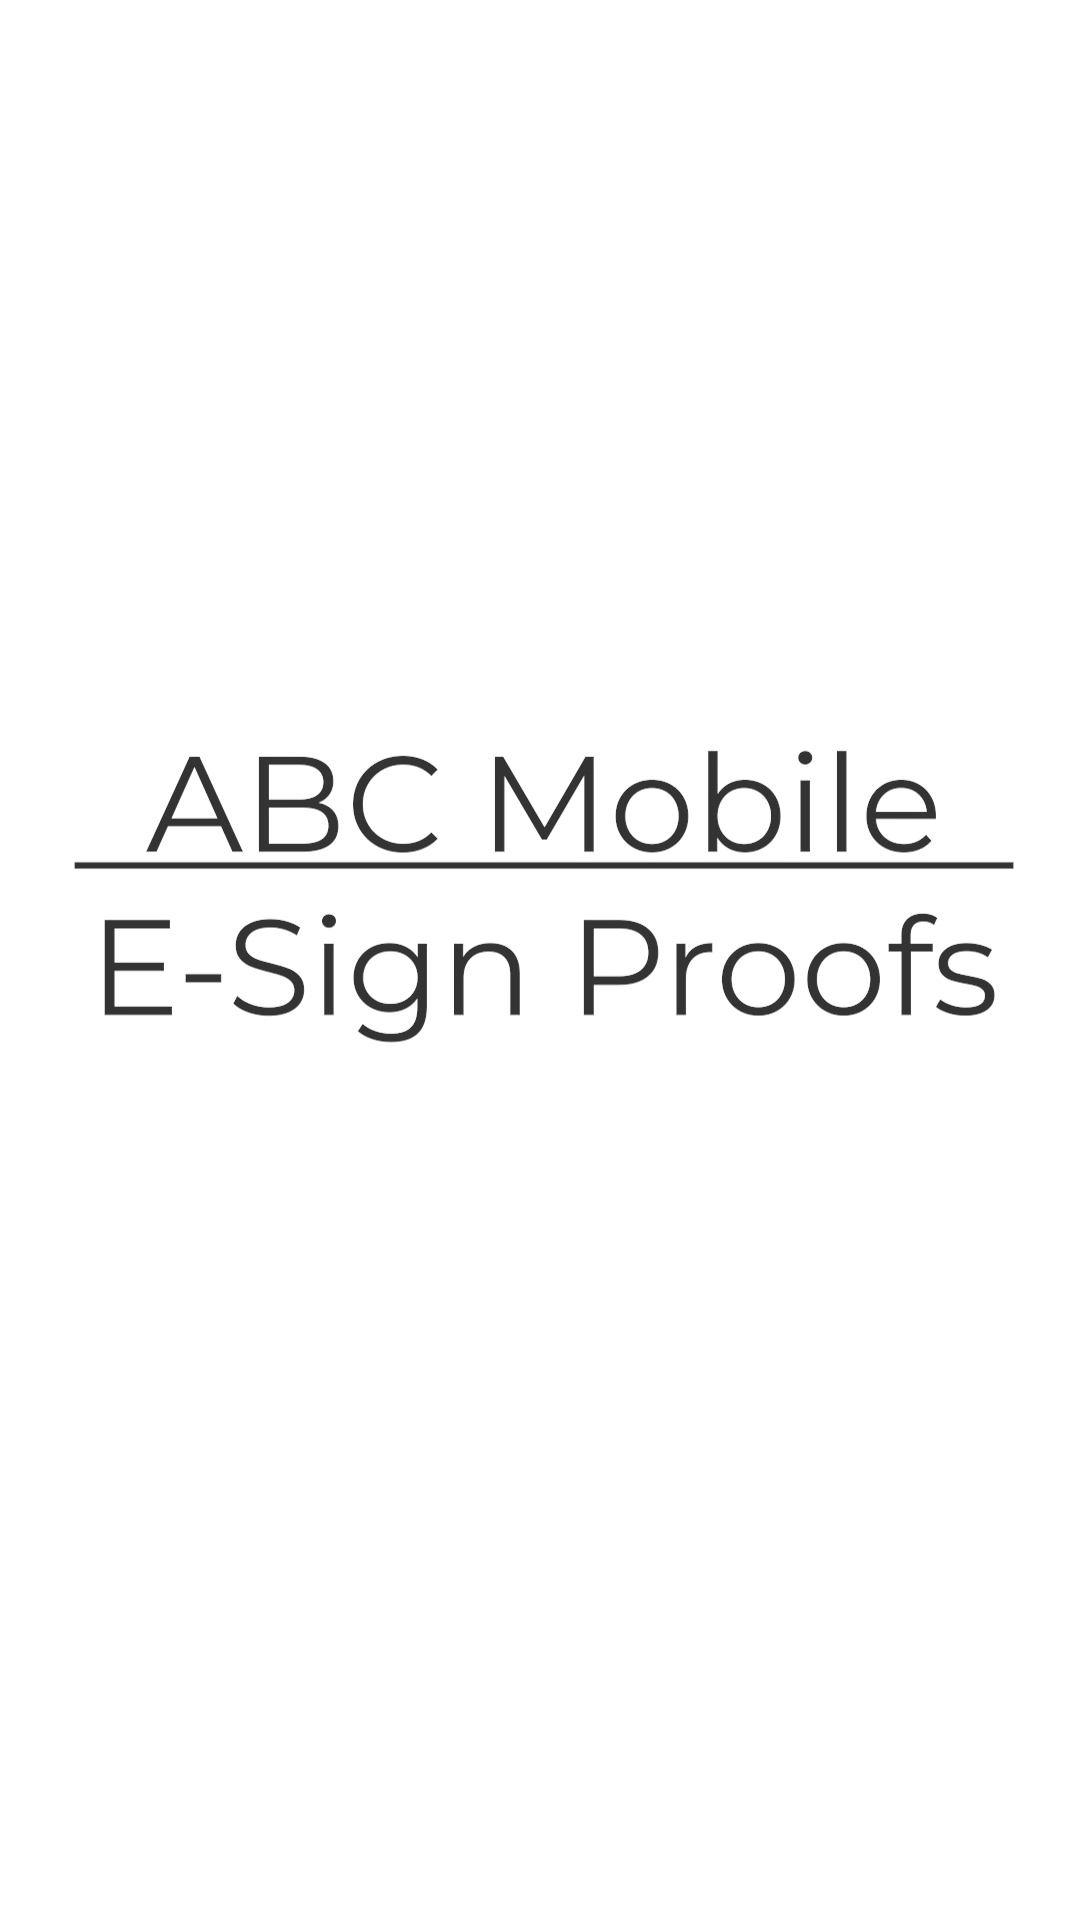 10 E-Sign Proofs